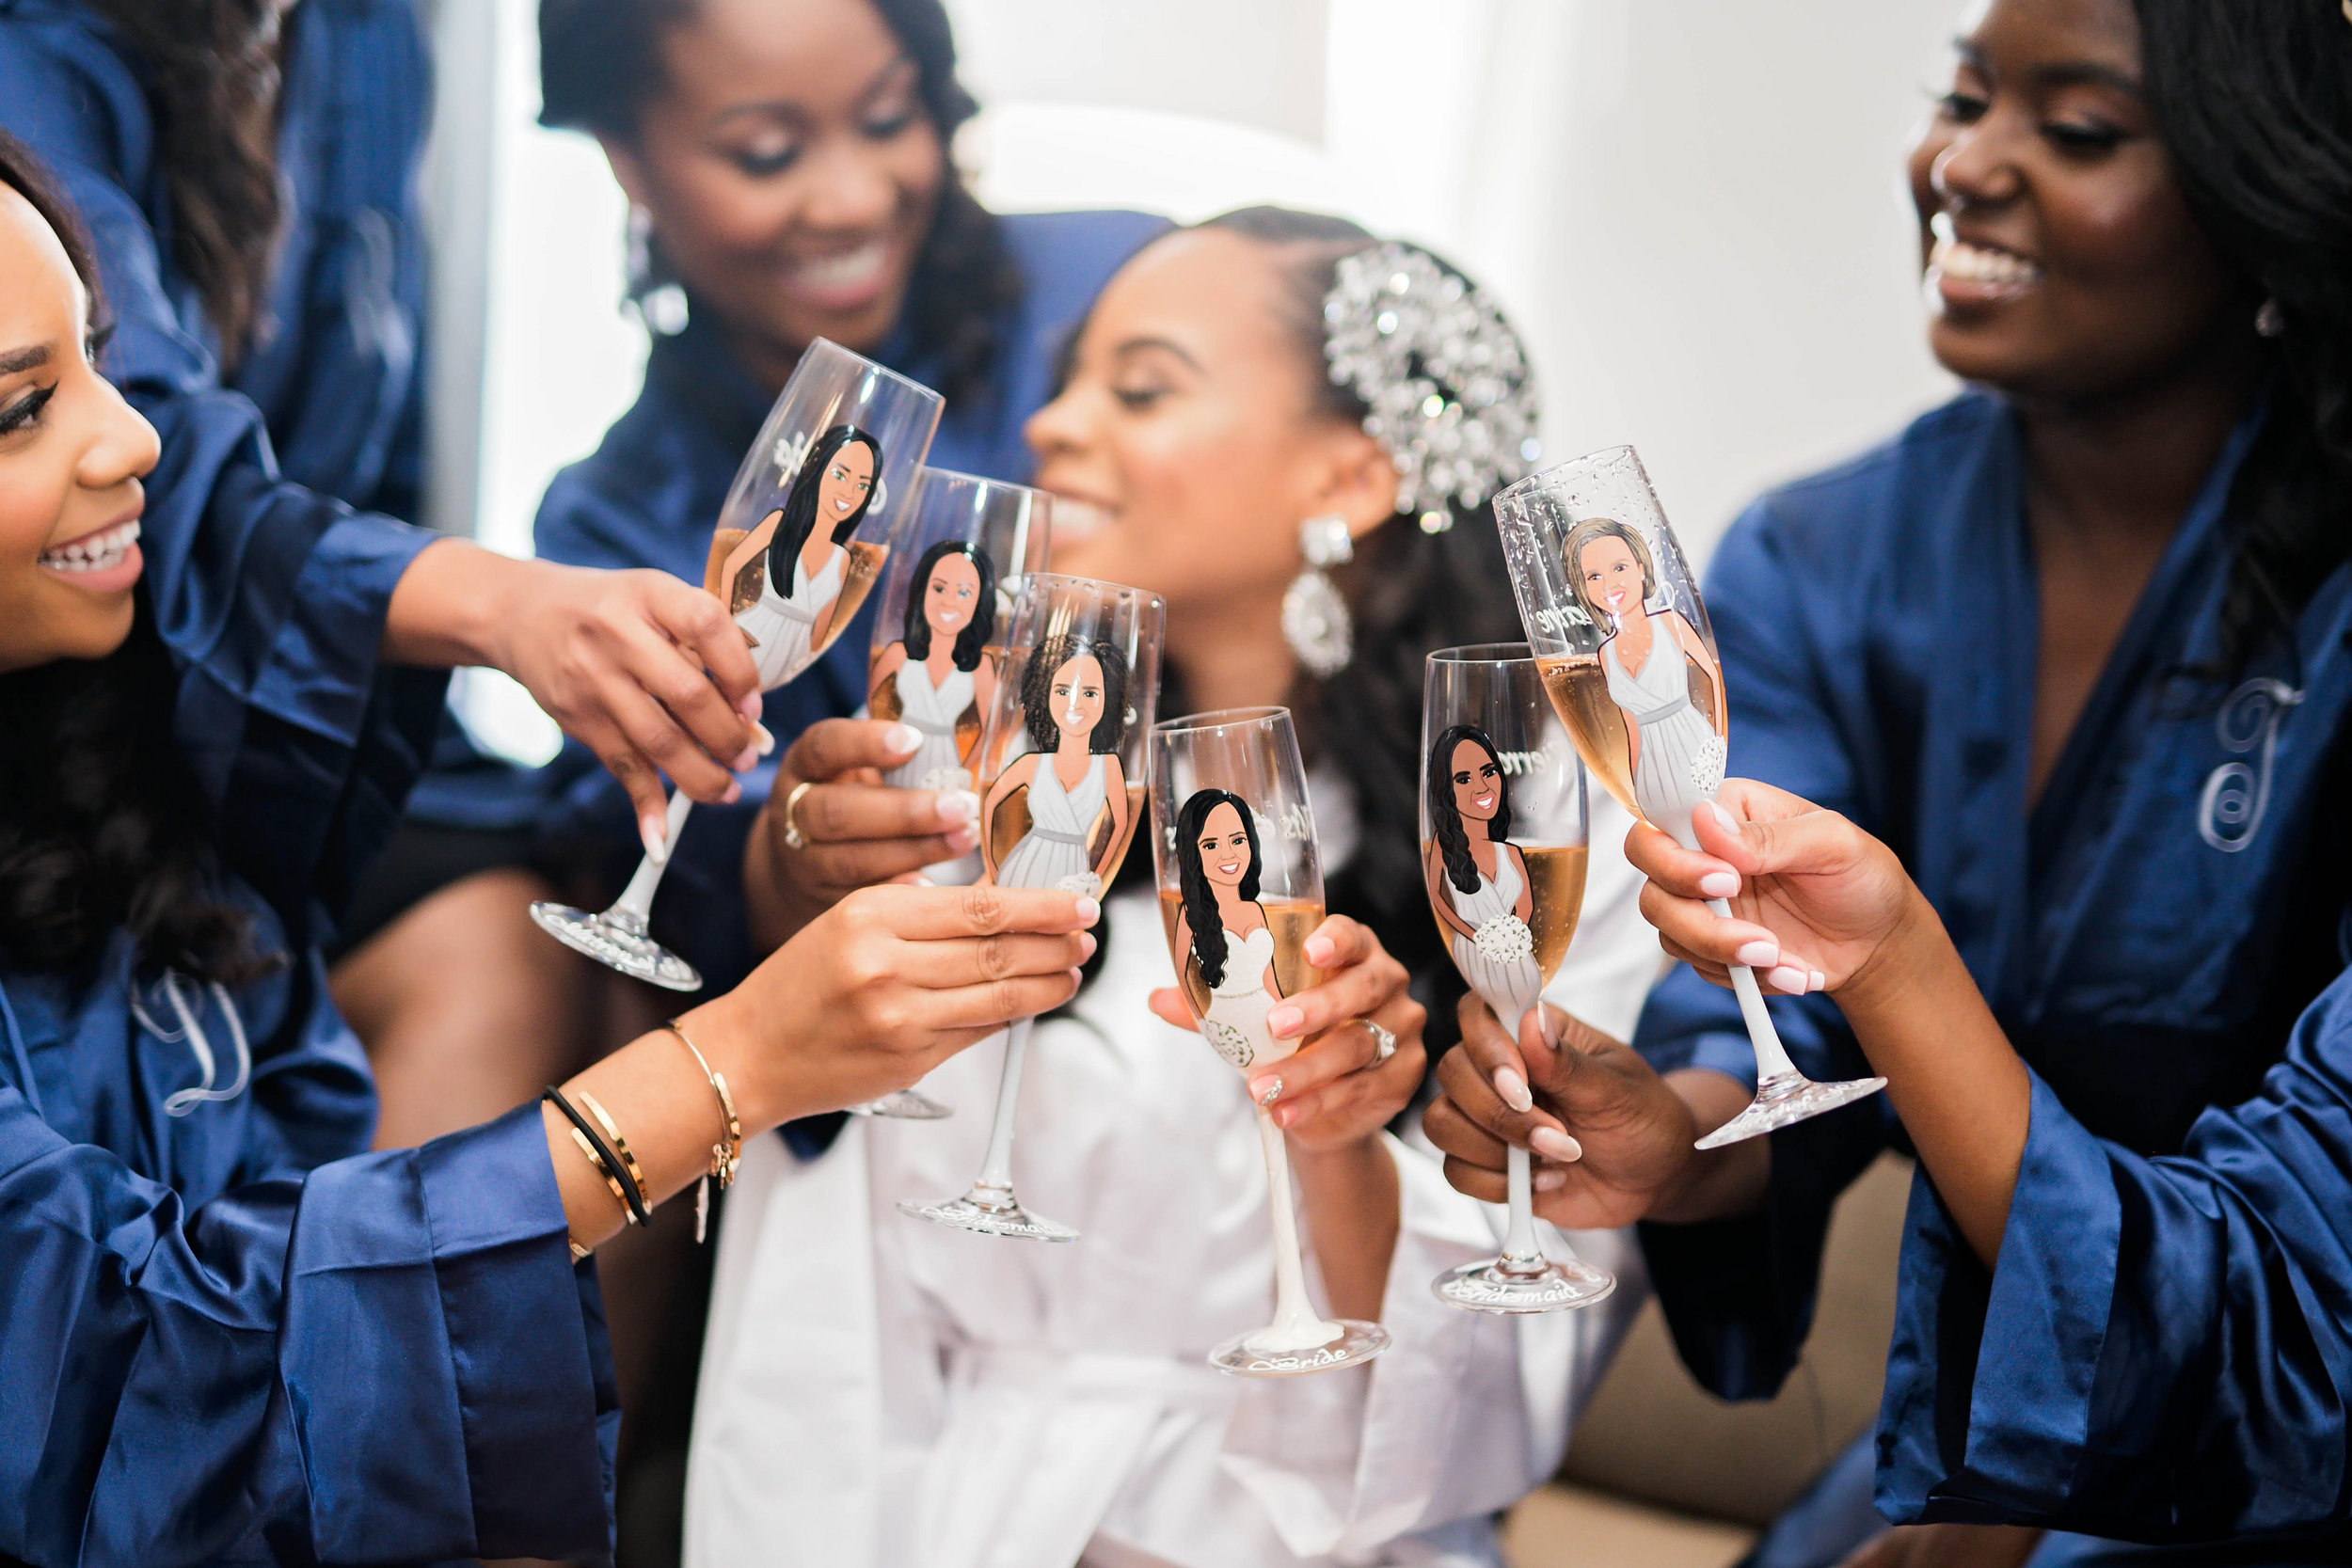 Tulsa Wedding- Pharris Photography- Getting Ready- Darla + Quinton- Bridesmaids- Champagne